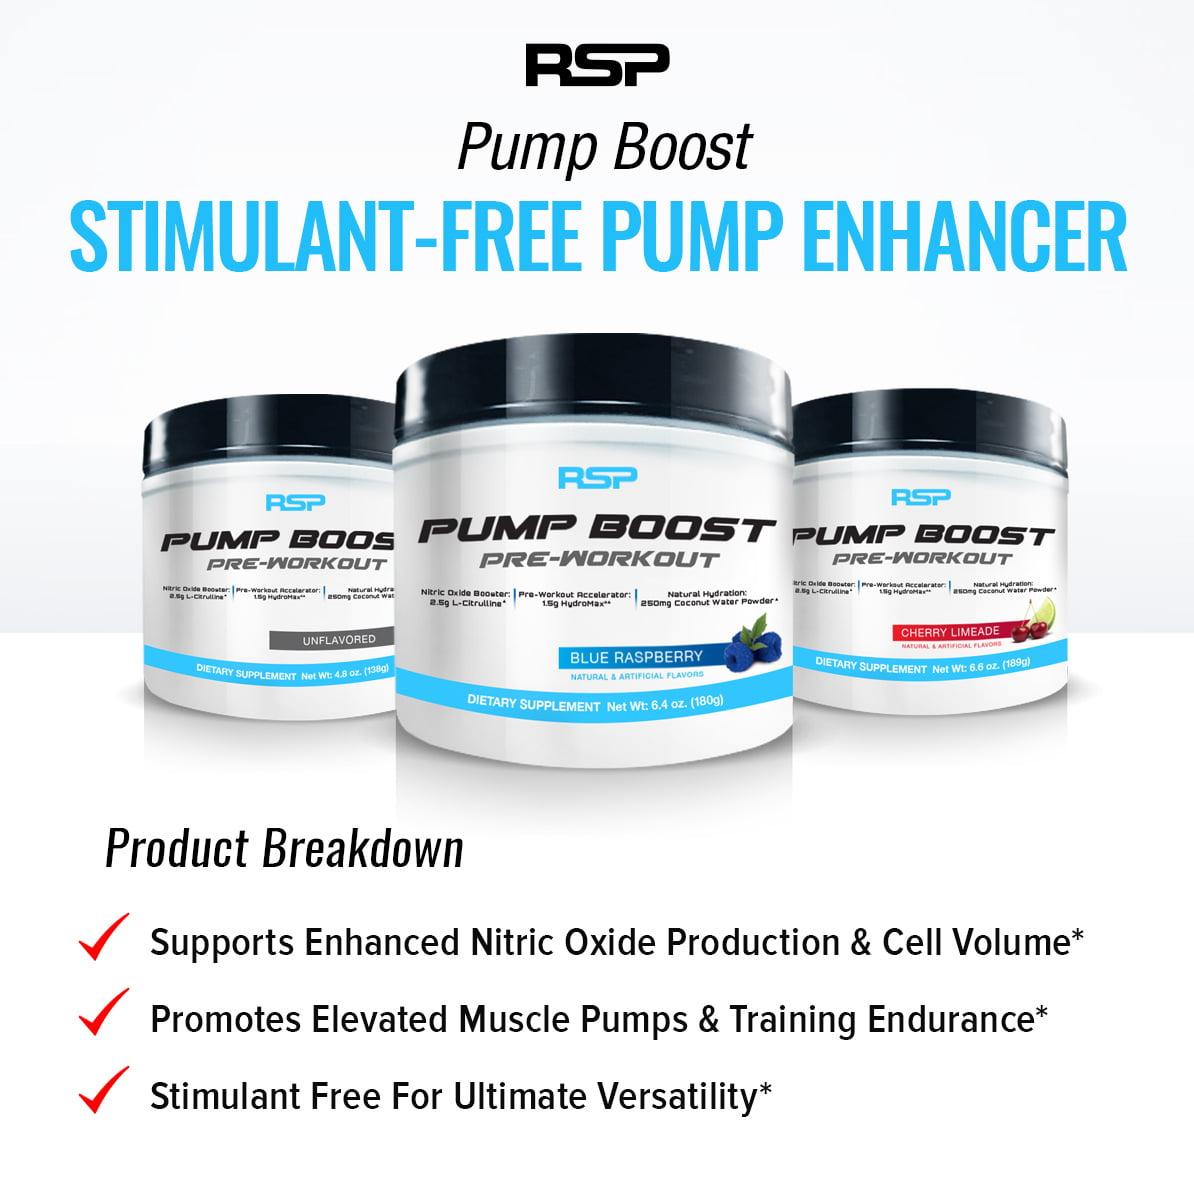 All Stars Pump Booster Test rsp nutrition pump boost - stimulant free pre workout, pump